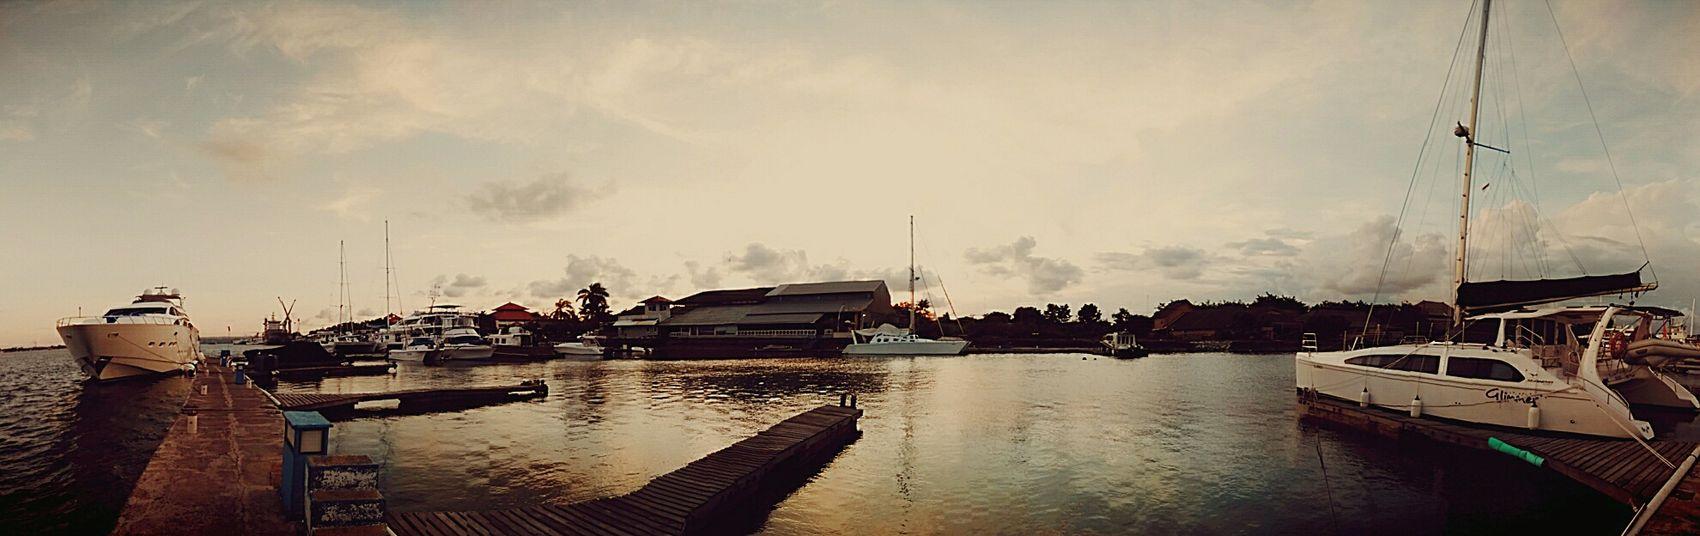 My escape Bali repicture travel Marina Boats Sunset RePicture Travel